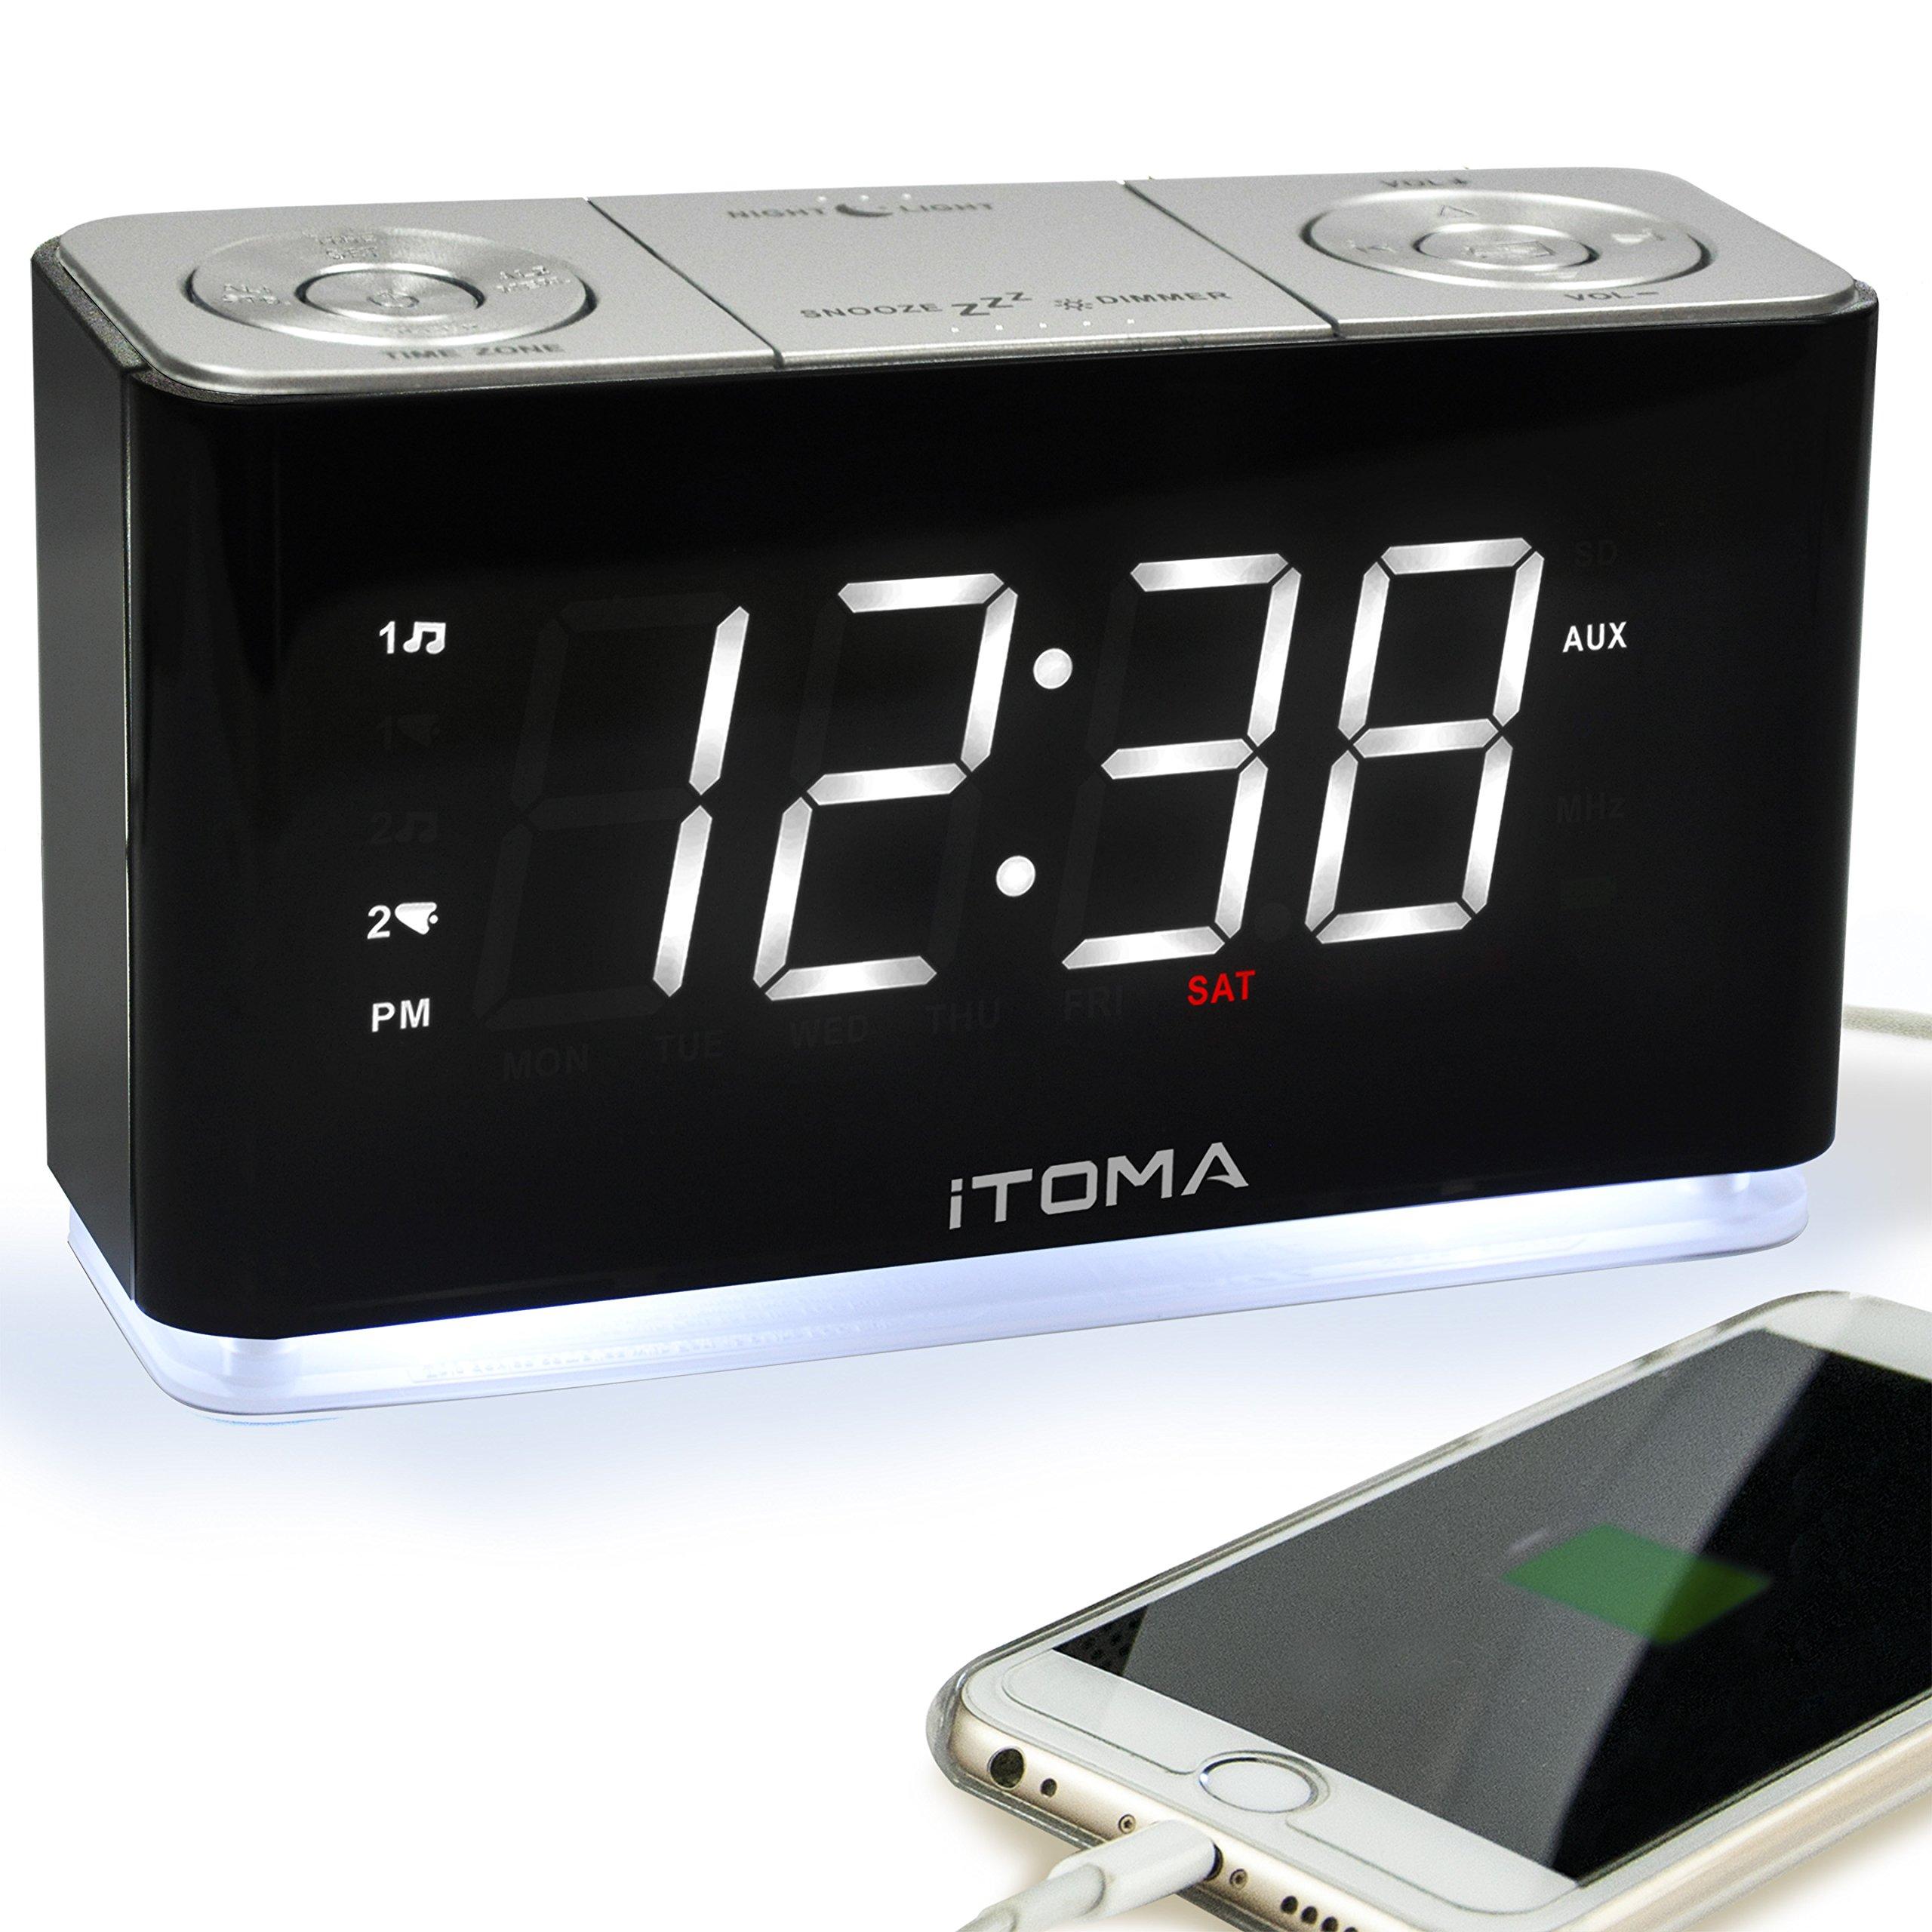 itoma 闹钟收音机,数码 FM 收音机,双报警,手机 USB 充电端口,夜灯,自动 & 手动调光器, SNOOZE ,睡眠计时器,自动时间设置, AUX-IN ,备份电池( cks507)